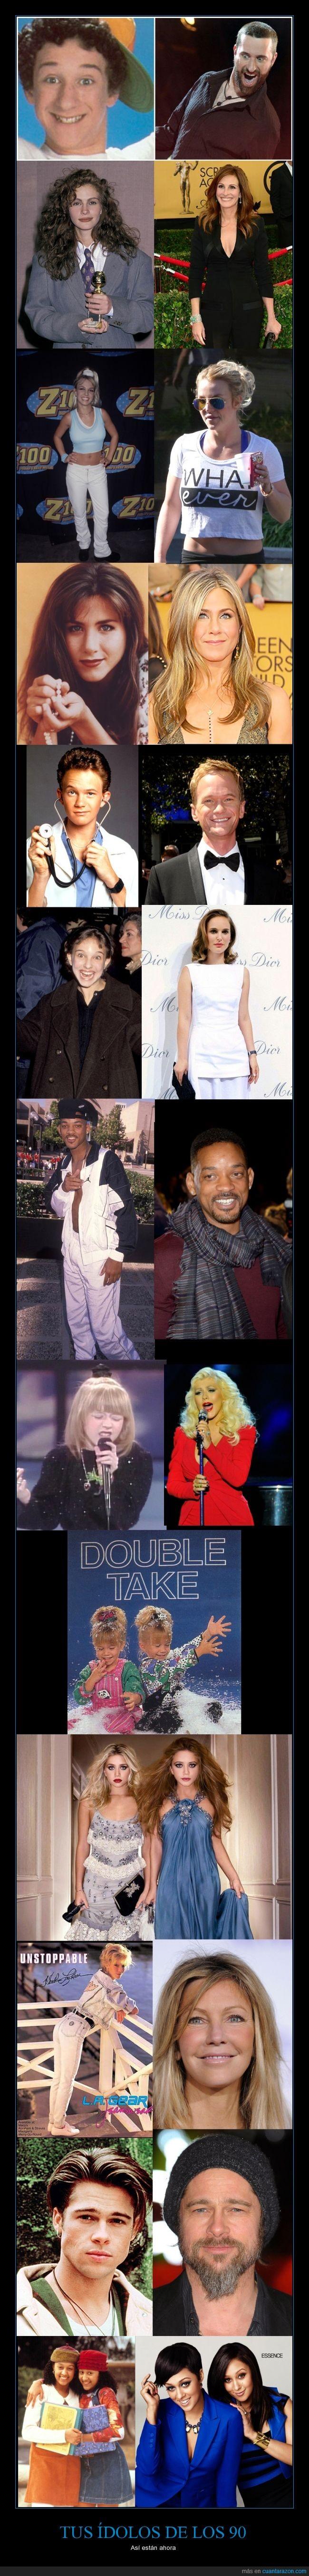 90,90's,brad pitt,Britney spears,christina aguilera,gemelas,idolo,Julia Roberts,Natalie Portman,Neil Patrick Harris,noventas,will smith